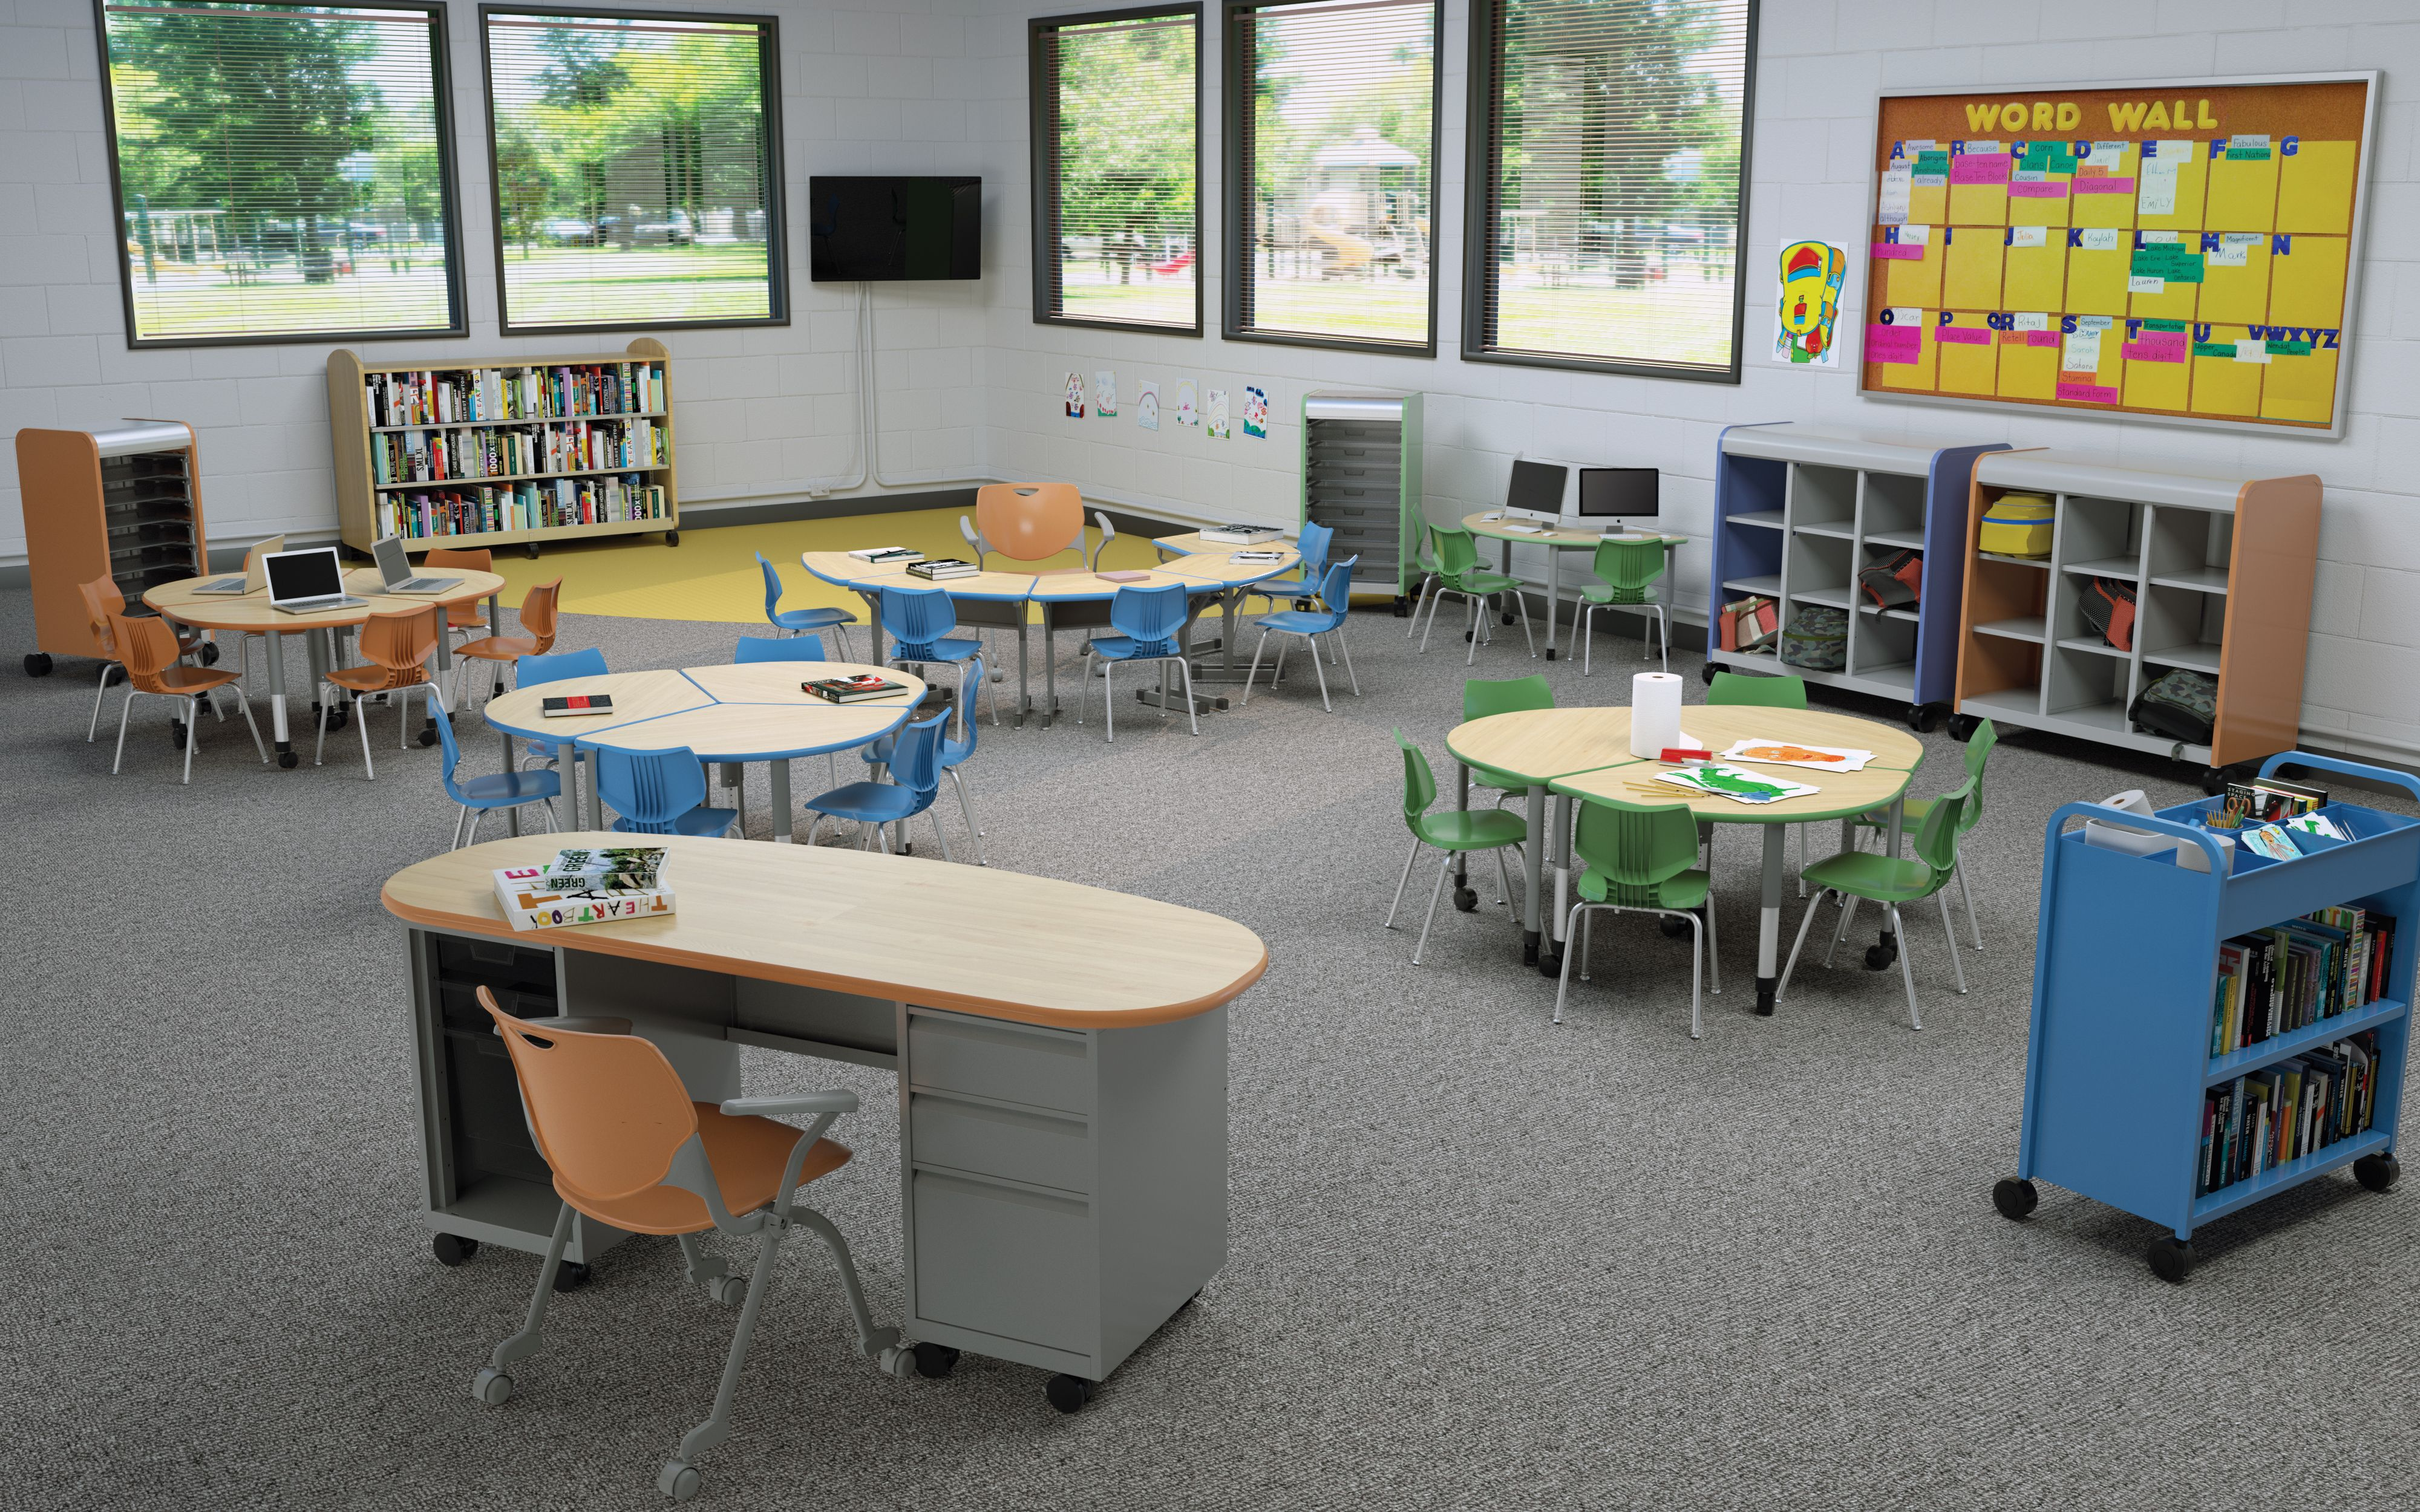 Classroom Environment Ideas ~ K environment cascade cubby collaborative desks